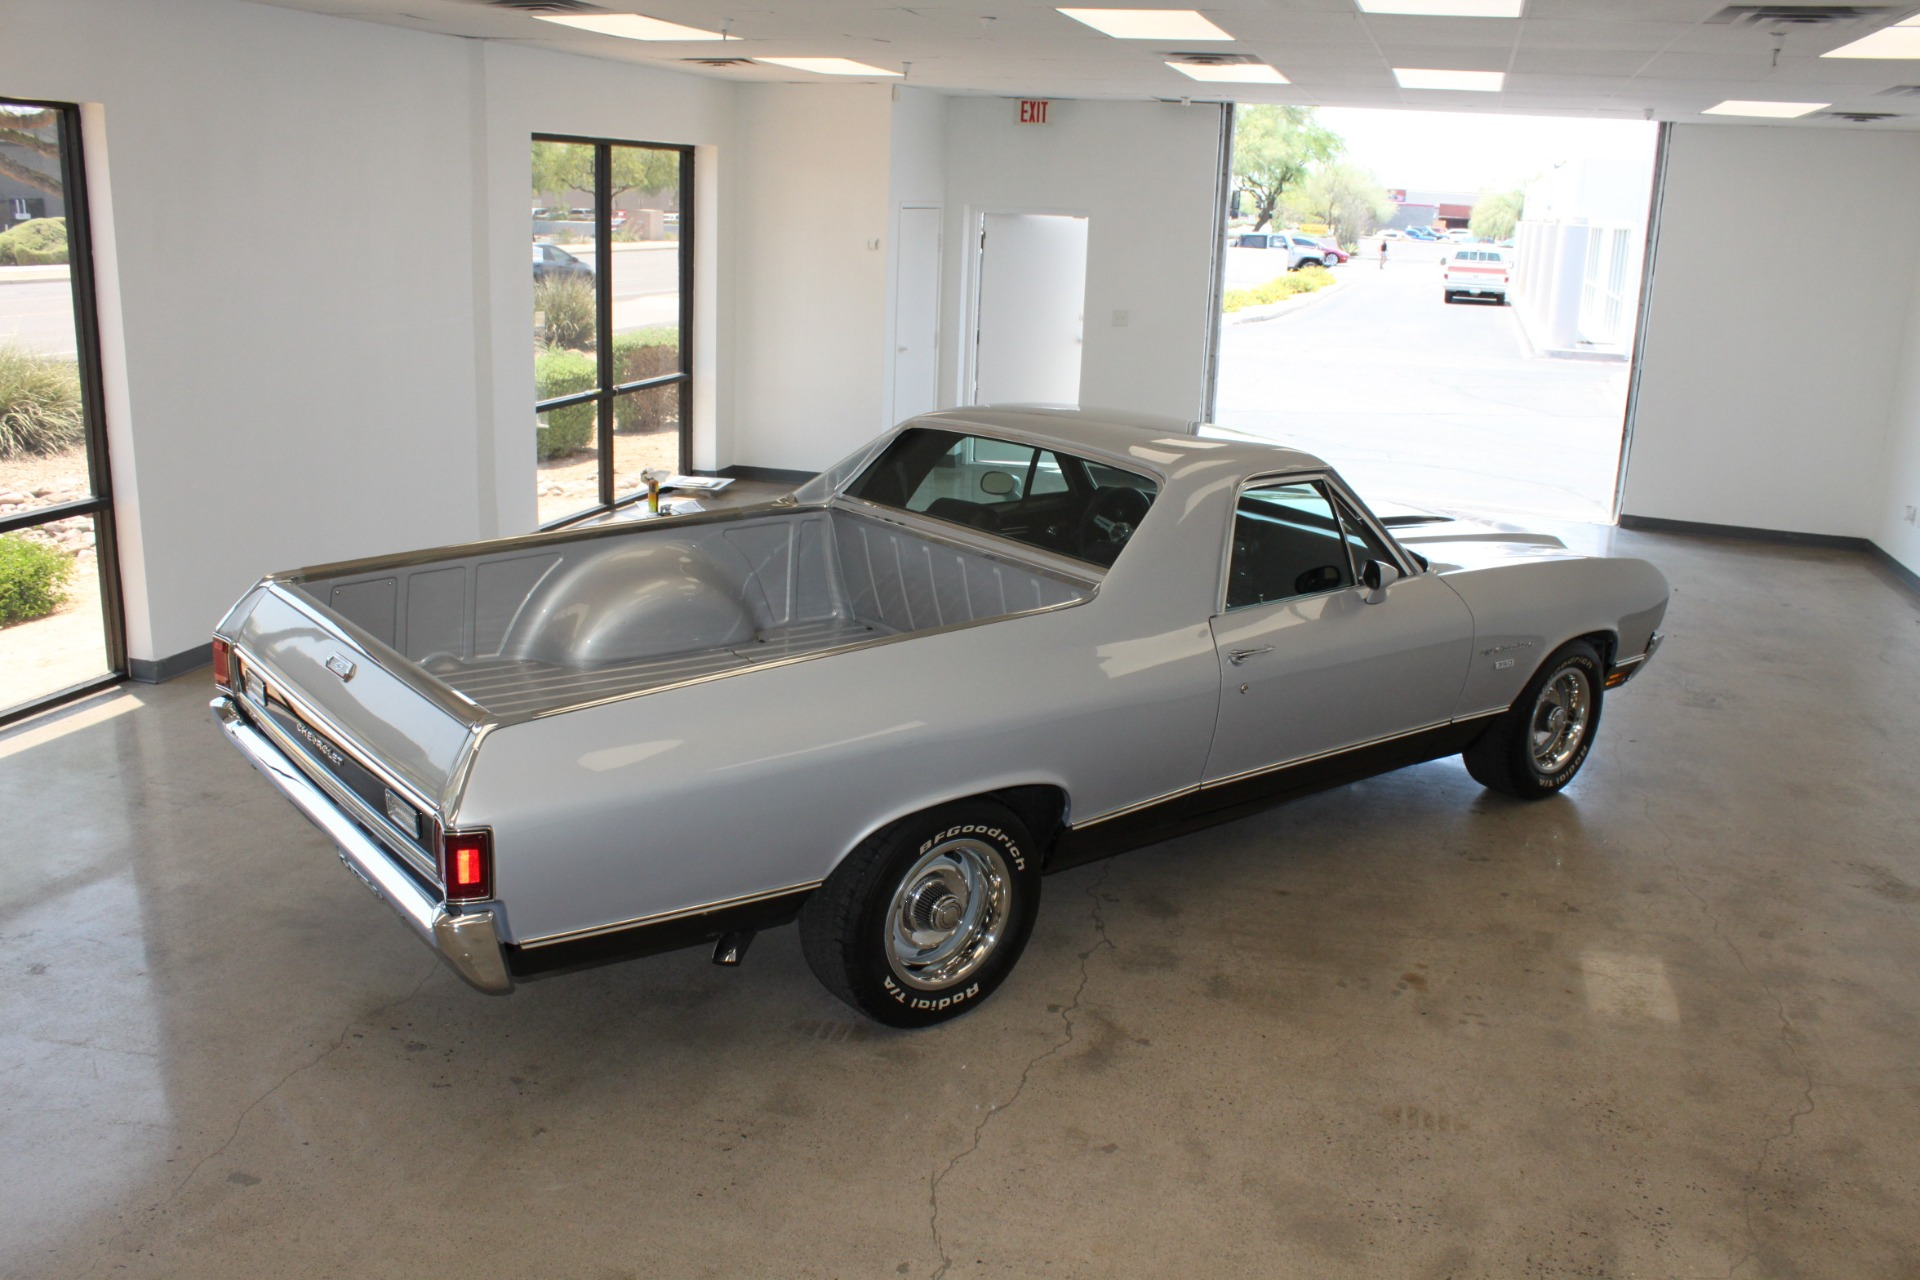 Used-1970-Chevrolet-El-Camino-Custom-350-ci-Fiat